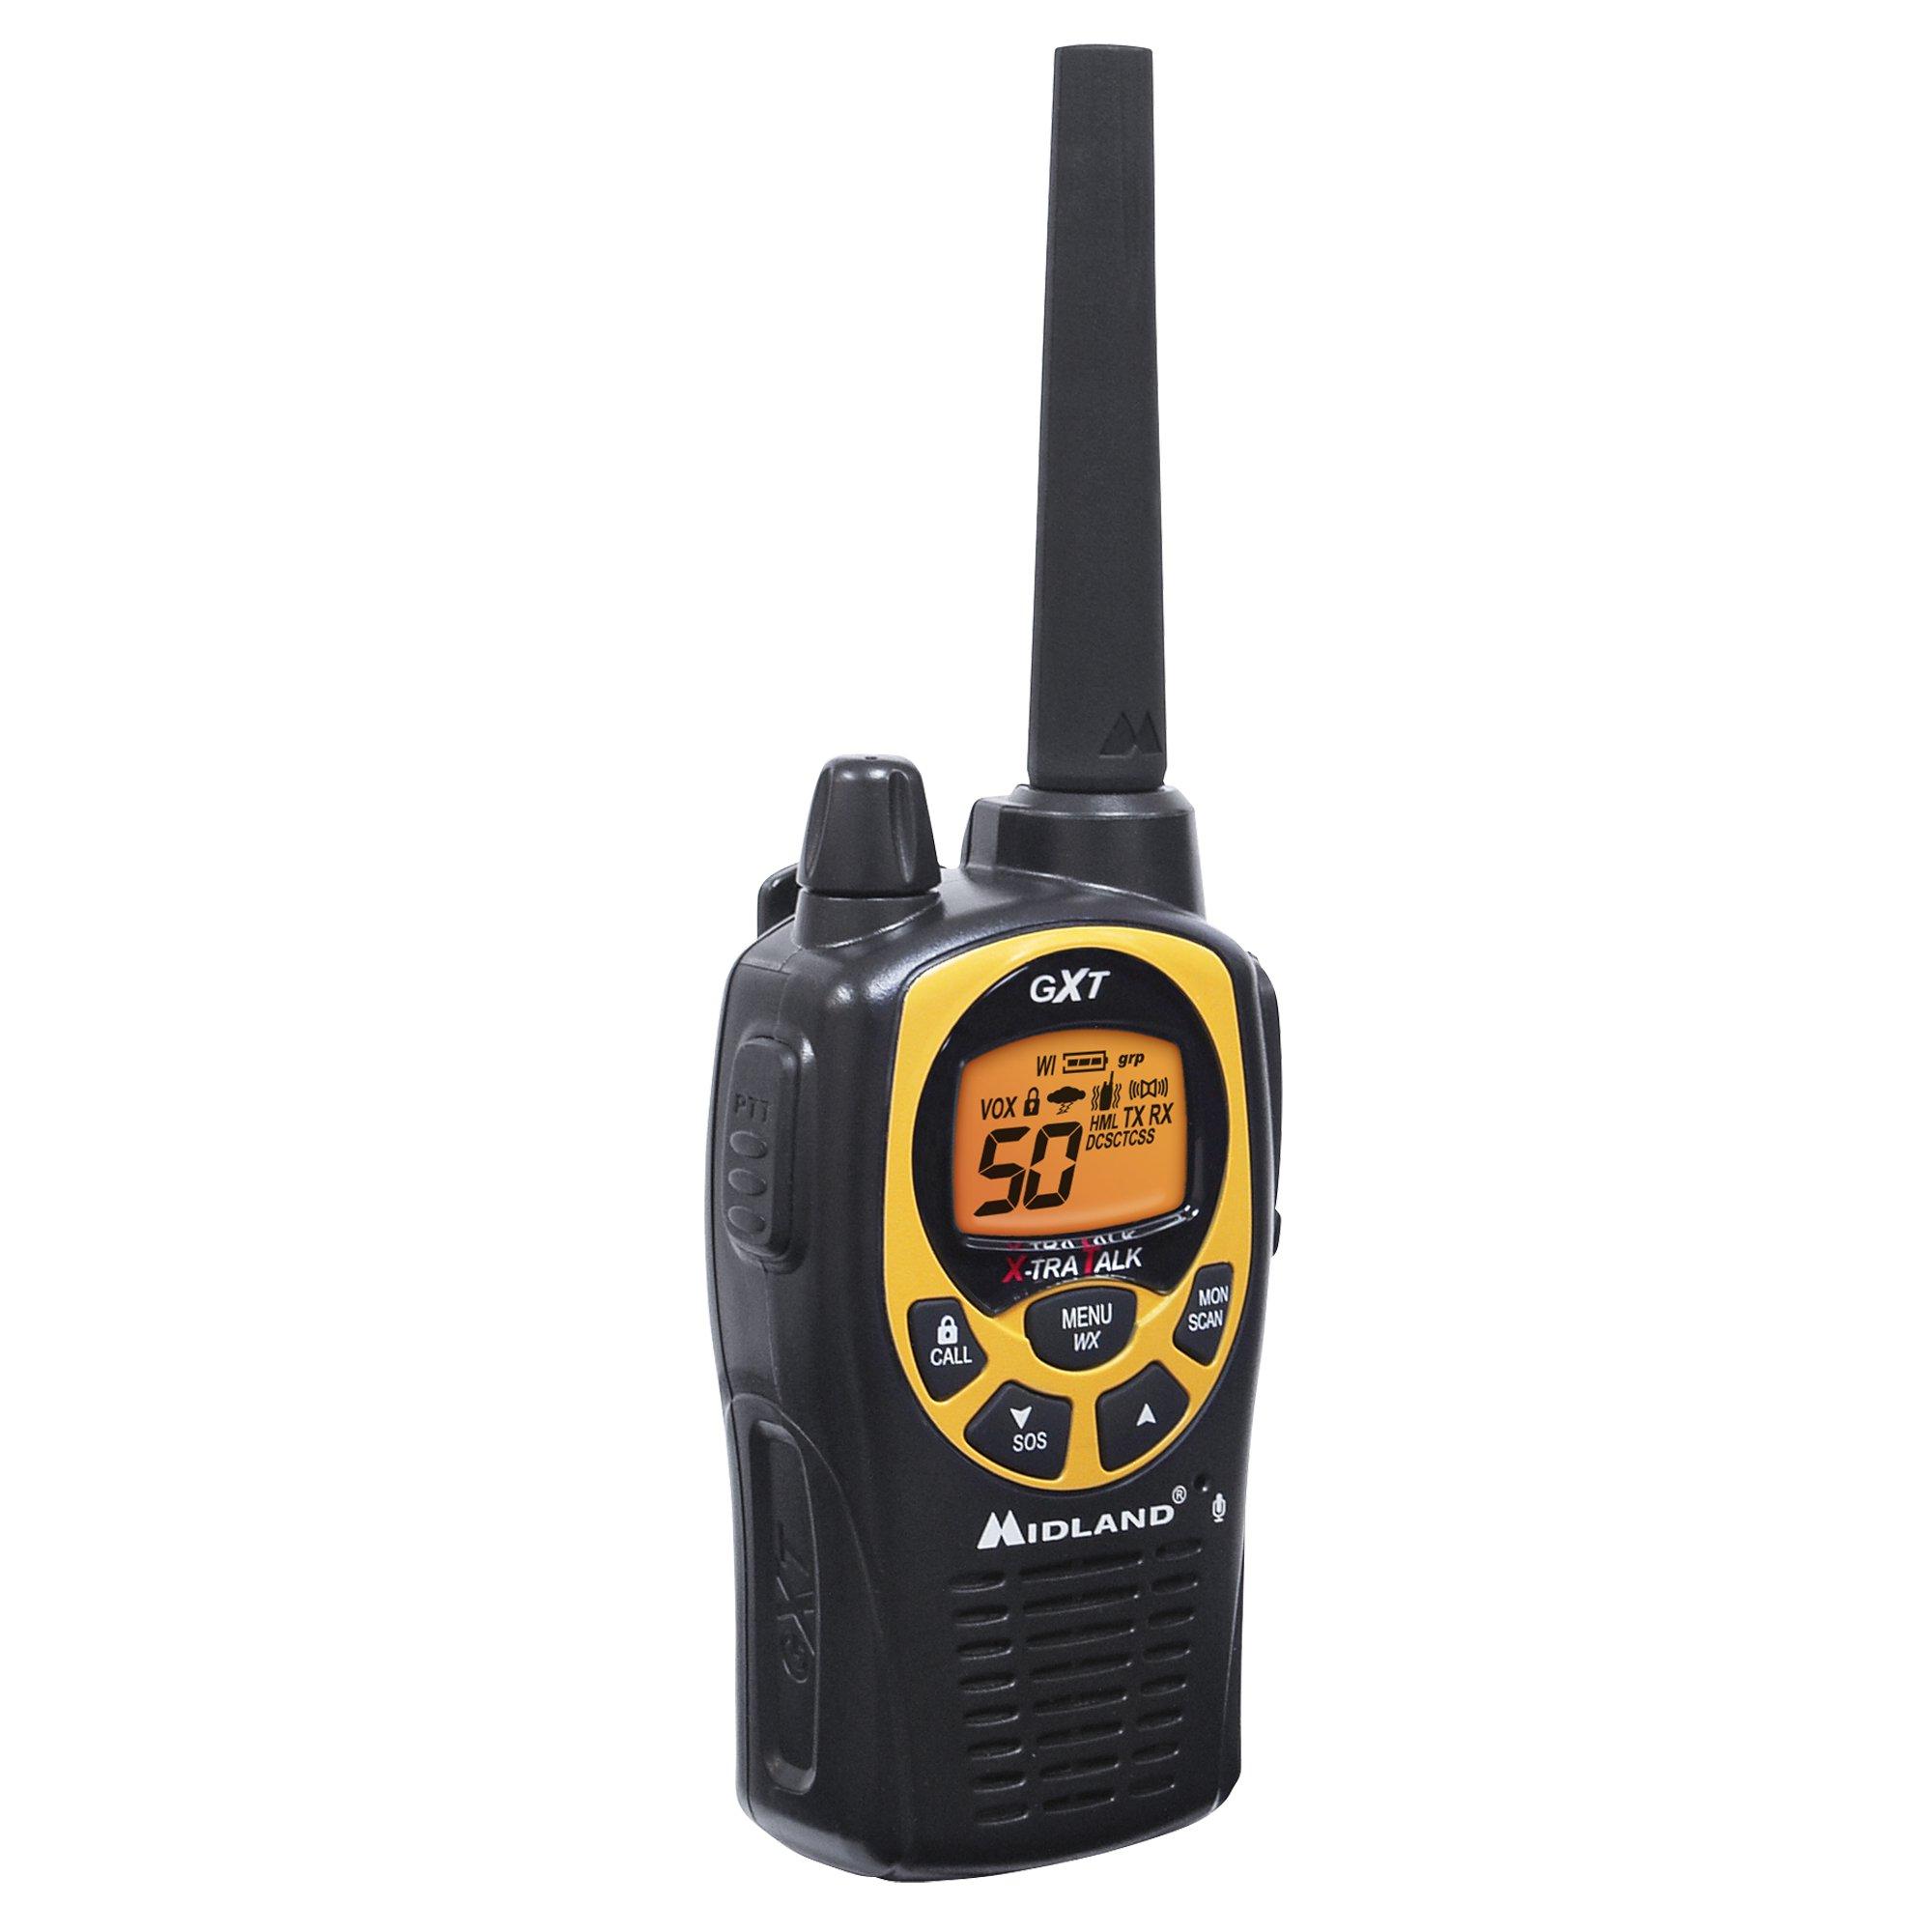 Midland - GXT1030VP4, 50 Channel GMRS Two-Way Radio - Up to 36 Mile Range Walkie Talkie, 142 Privacy Codes, Waterproof, NOAA Weather Scan + Alert (Pair Pack) (Black/Yellow) by Midland (Image #3)